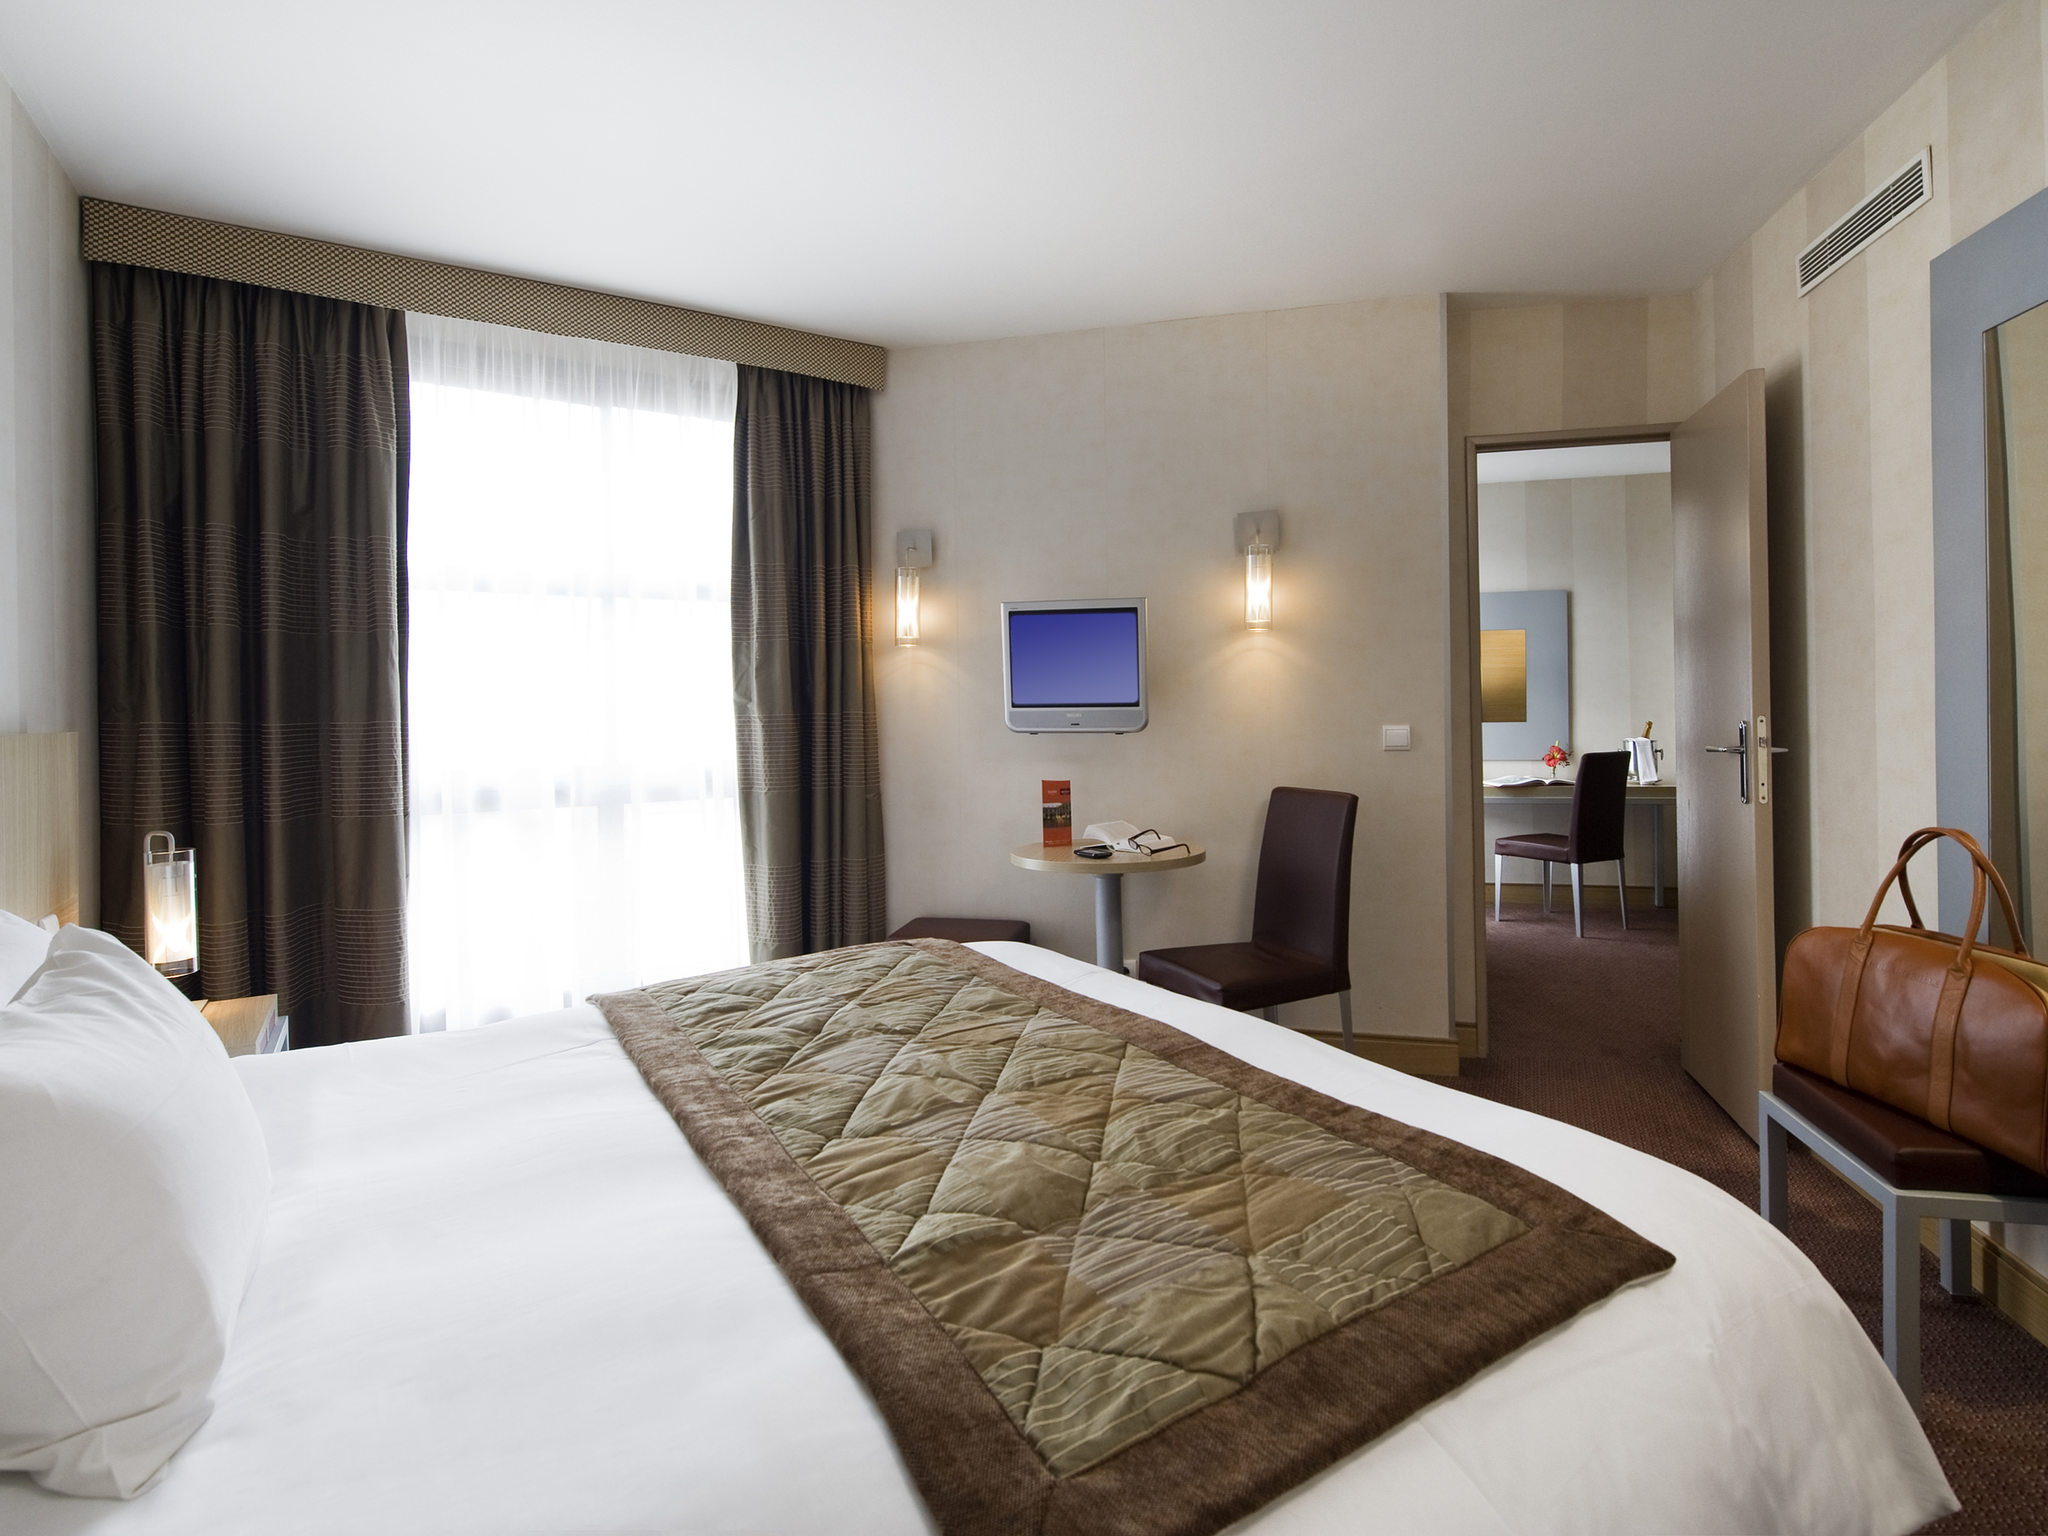 Hotel – Hotel Mercure Parijs Gobelins Place d'Italie